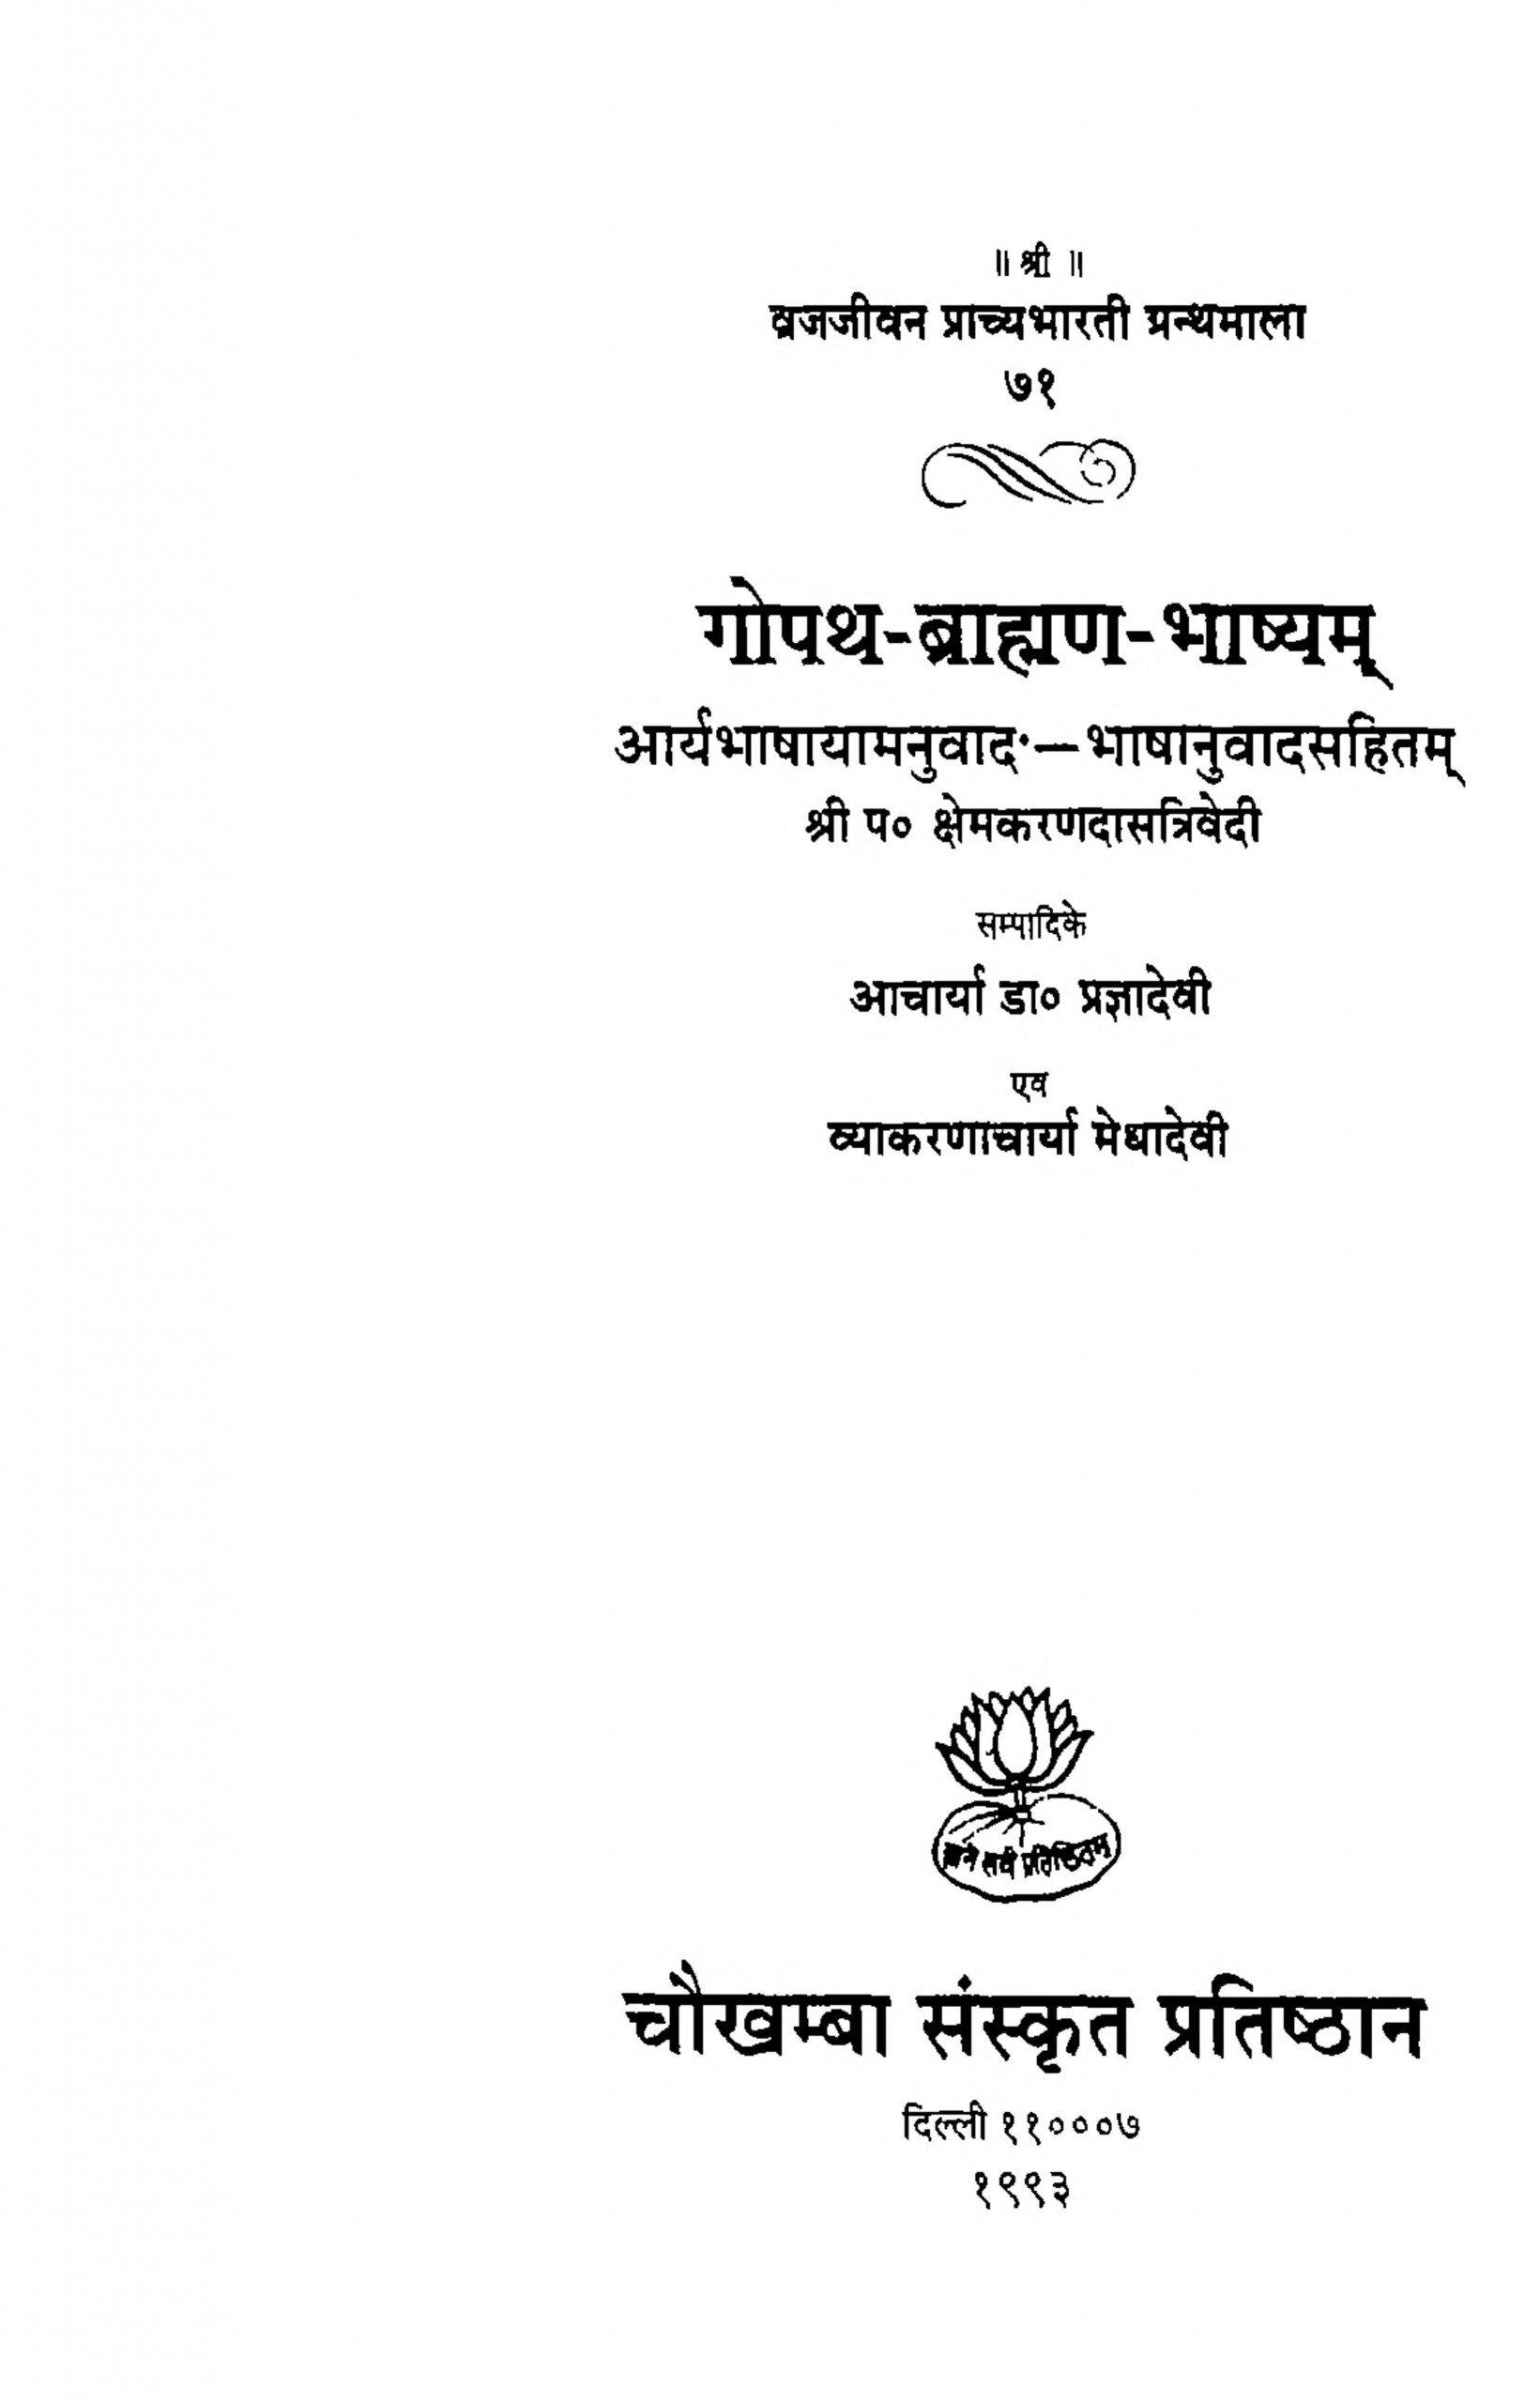 Book Image : गोपथ ब्राह्मण भाष्यम - Gopata Brahmana Bhashya